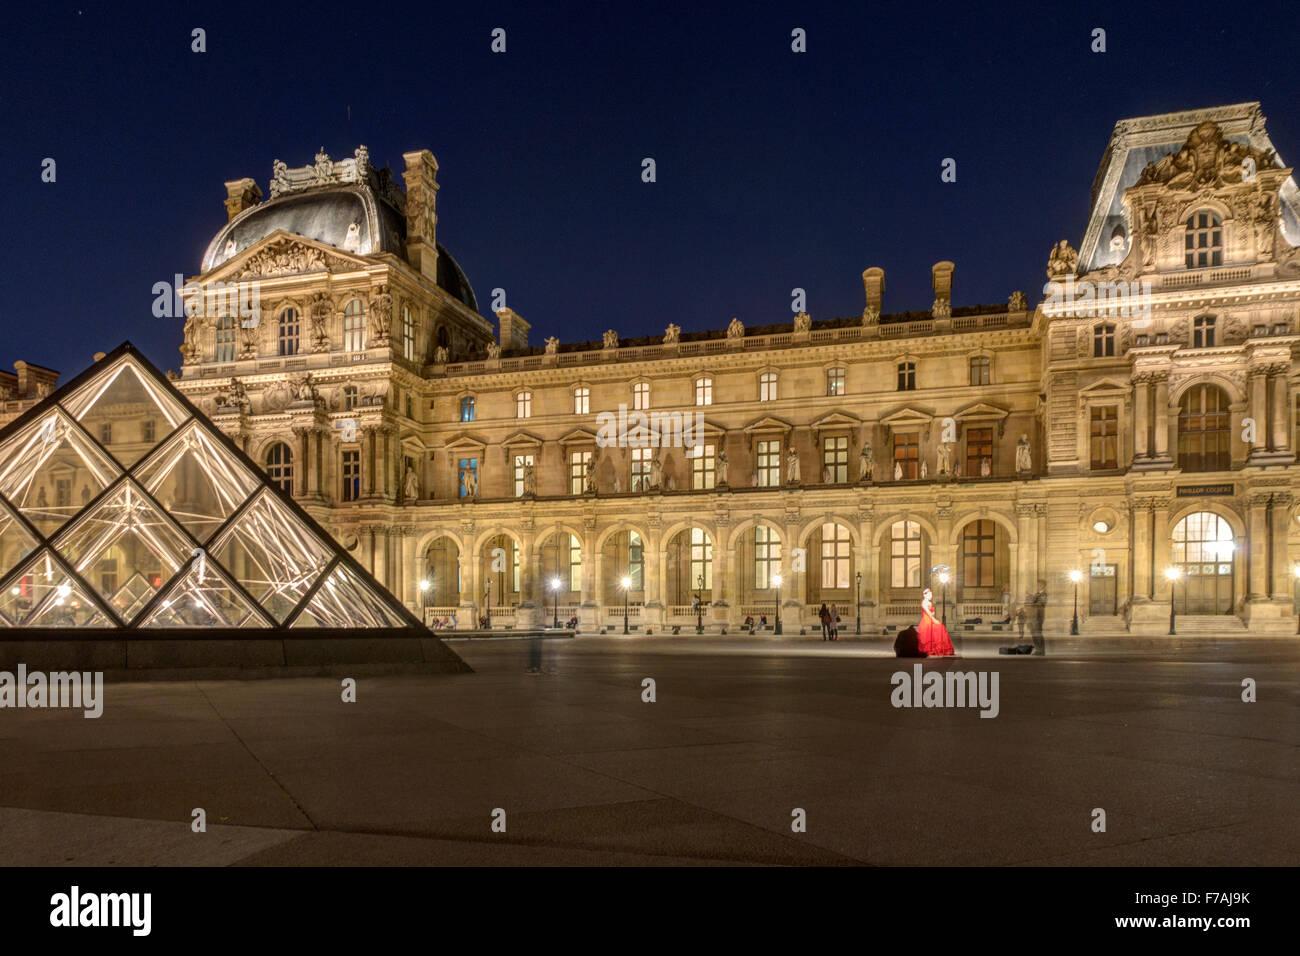 El Louvre Paris Imagen De Stock